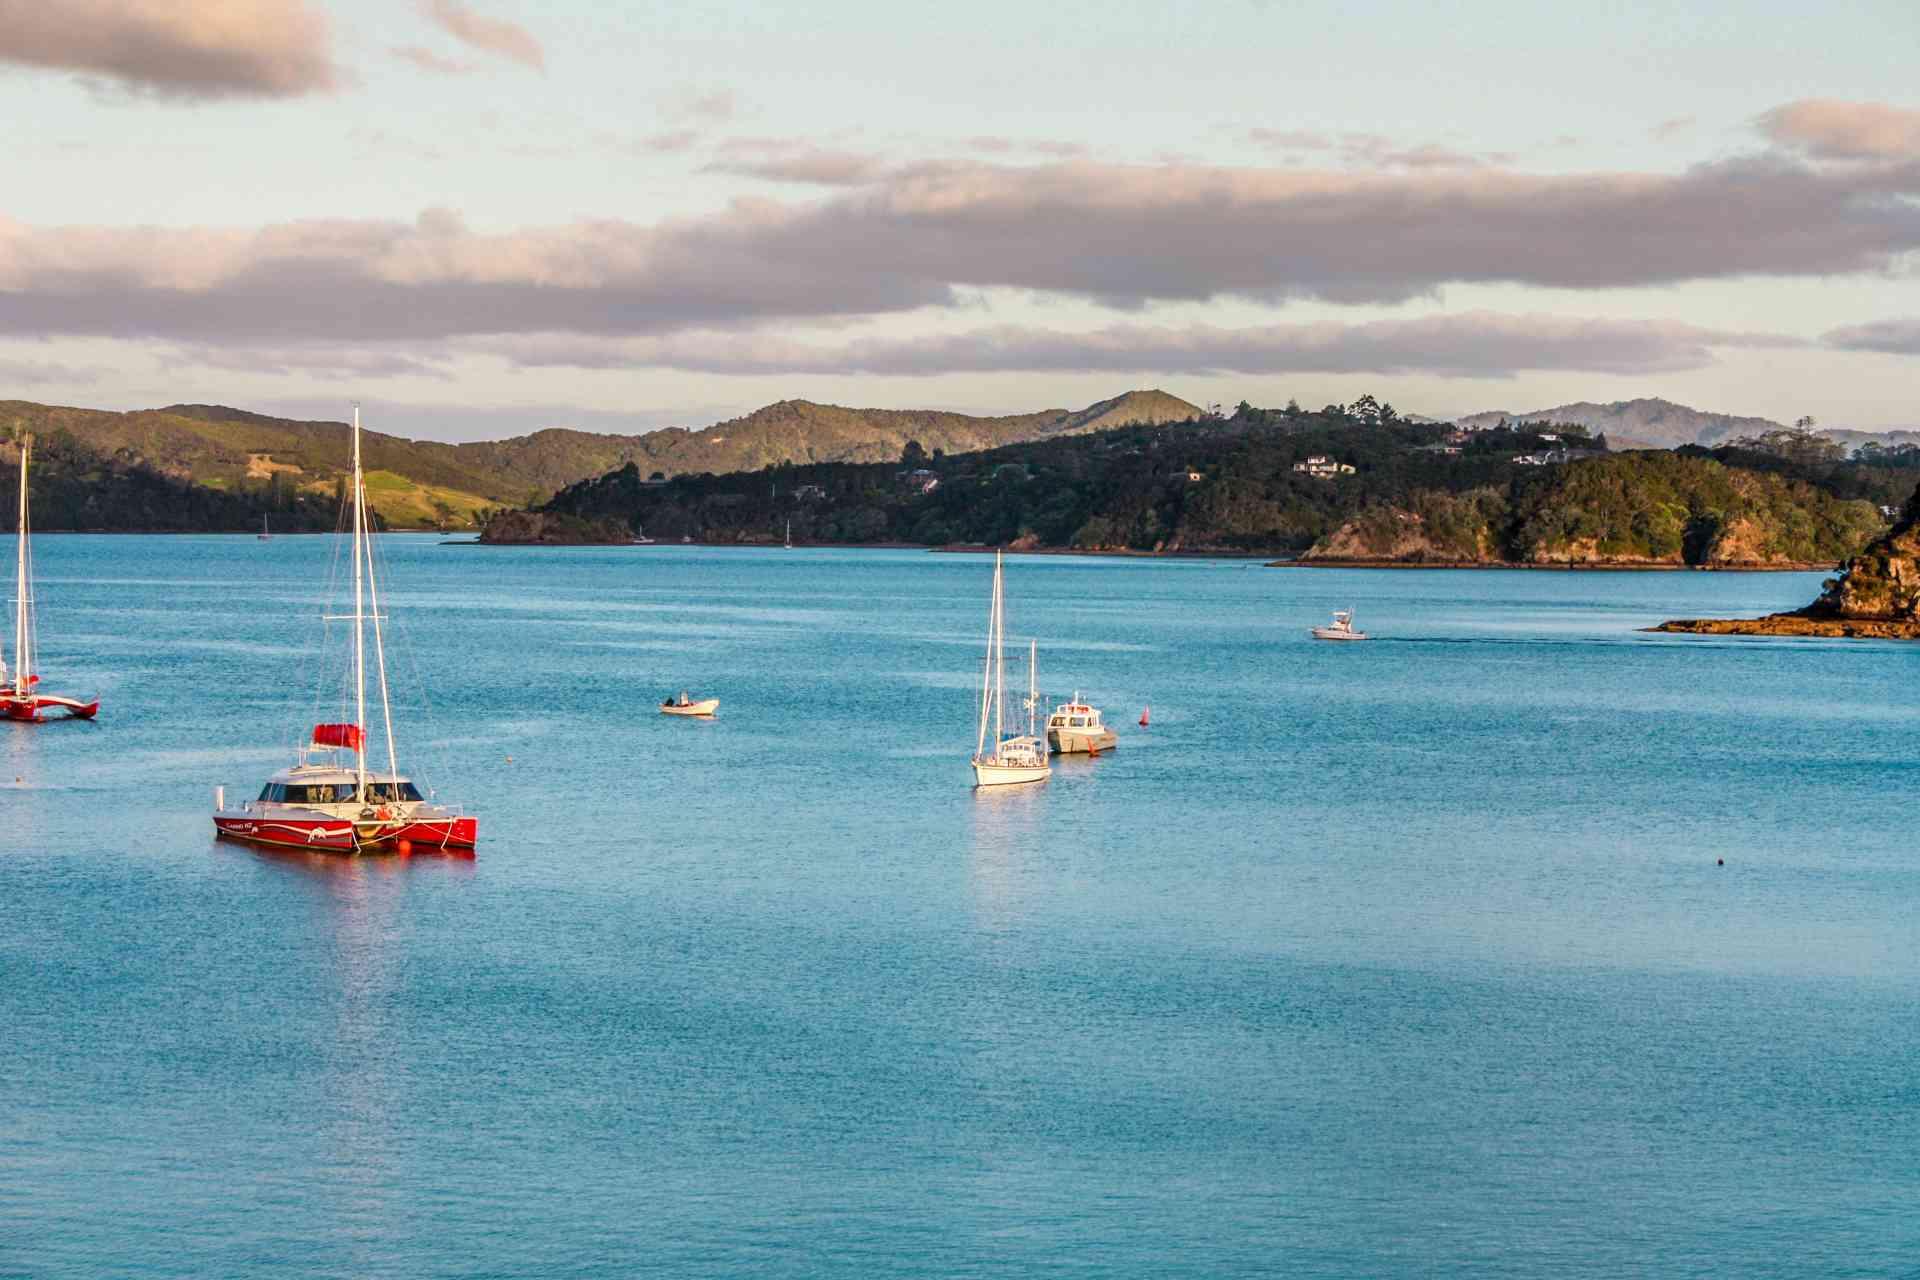 Paihia, New Zealand by Amit Kakroo